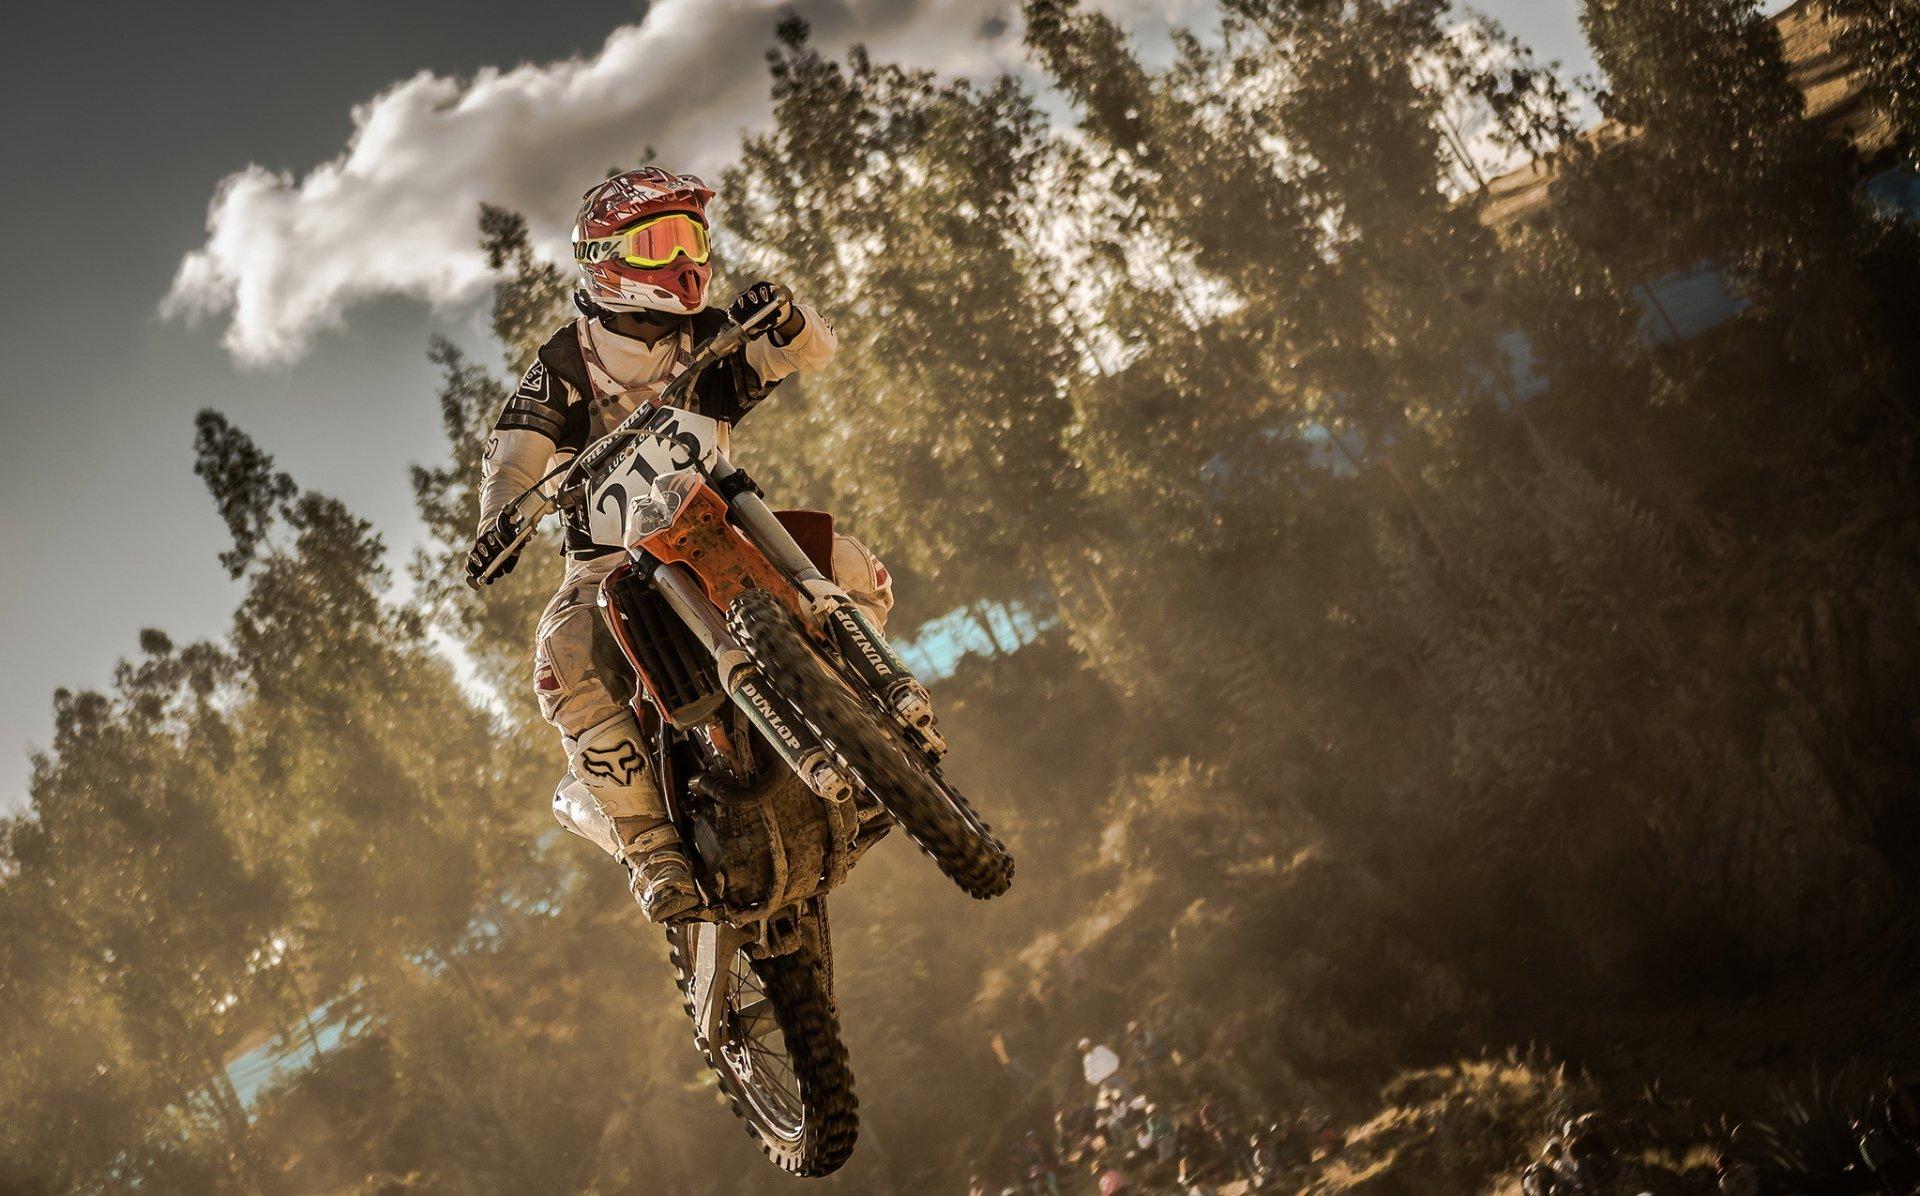 Moto G4 Wallpaper: Moto-cross Fond D'écran HD